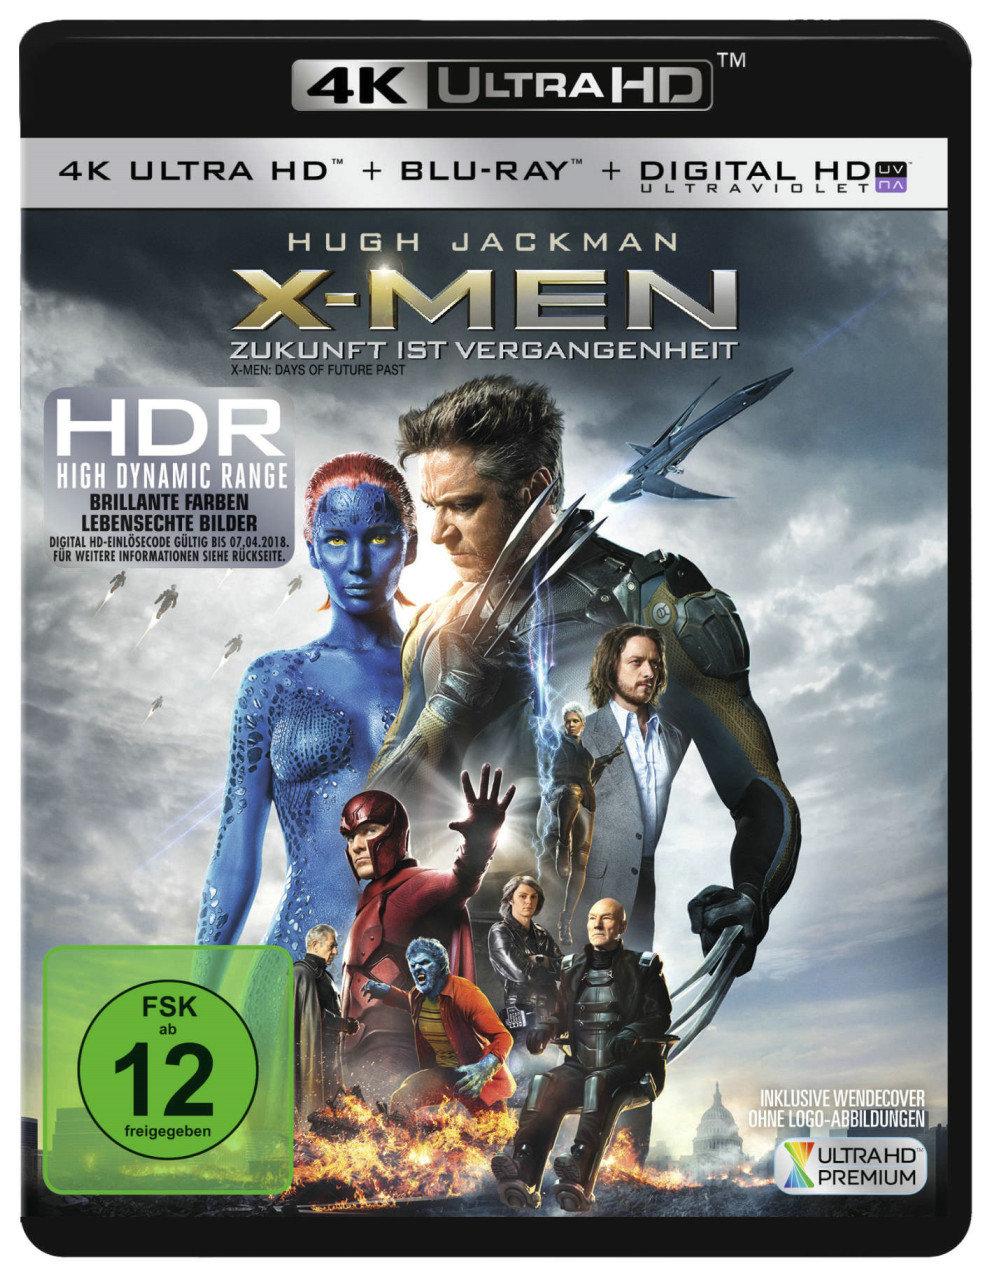 X-Men: Zukunft ist Vergangenheit 4K (2014) - (4K Ultra HD & Blu-ray)